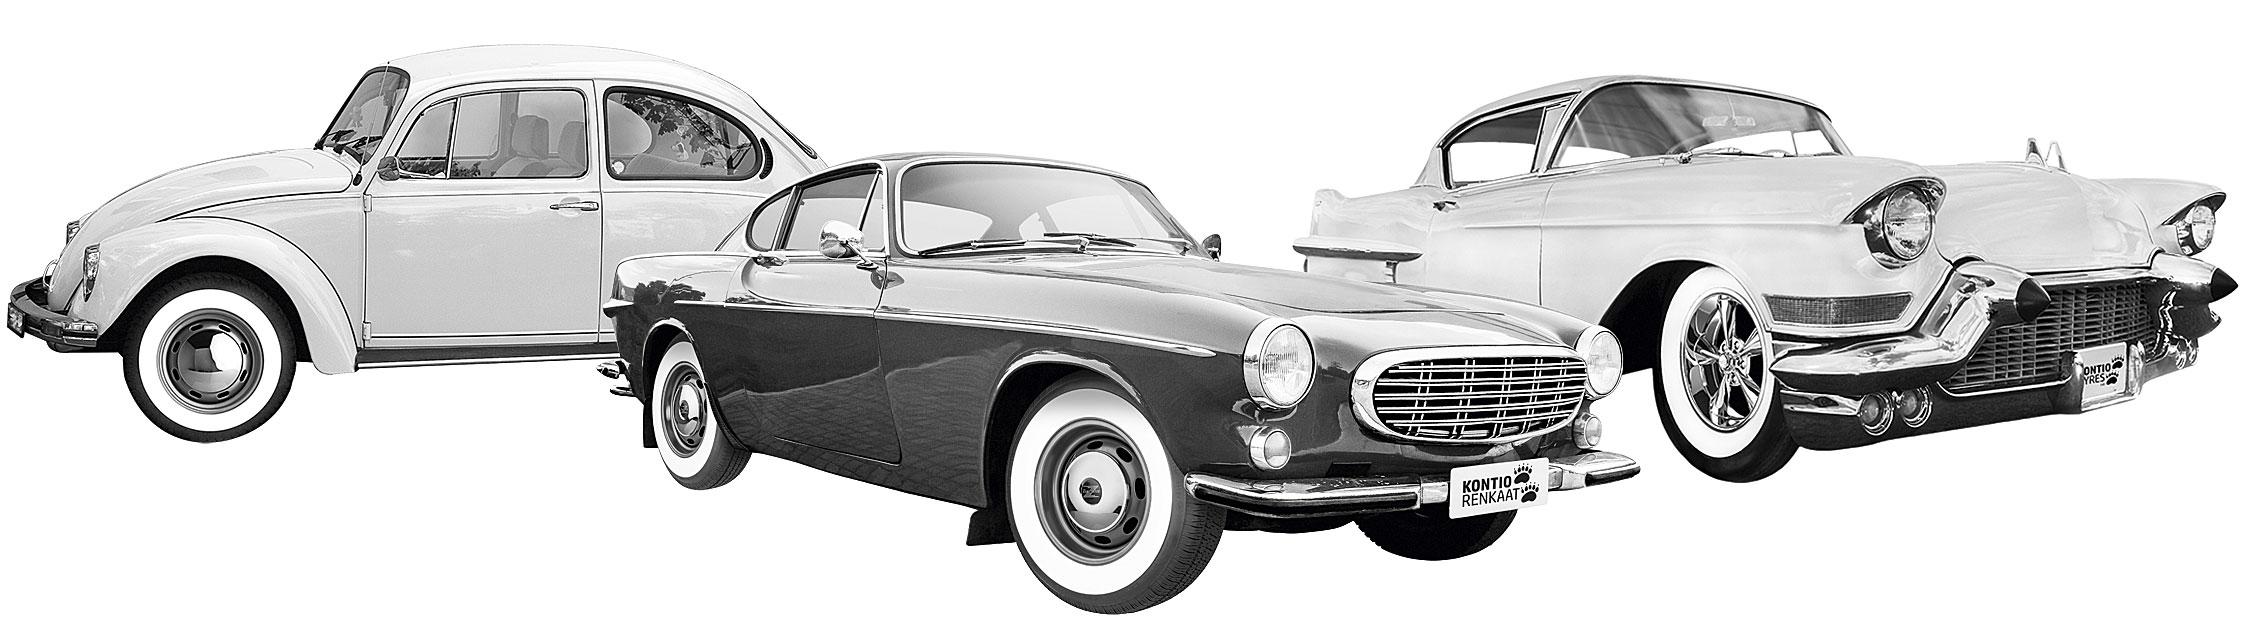 Kontio WhitePaw Classic cars